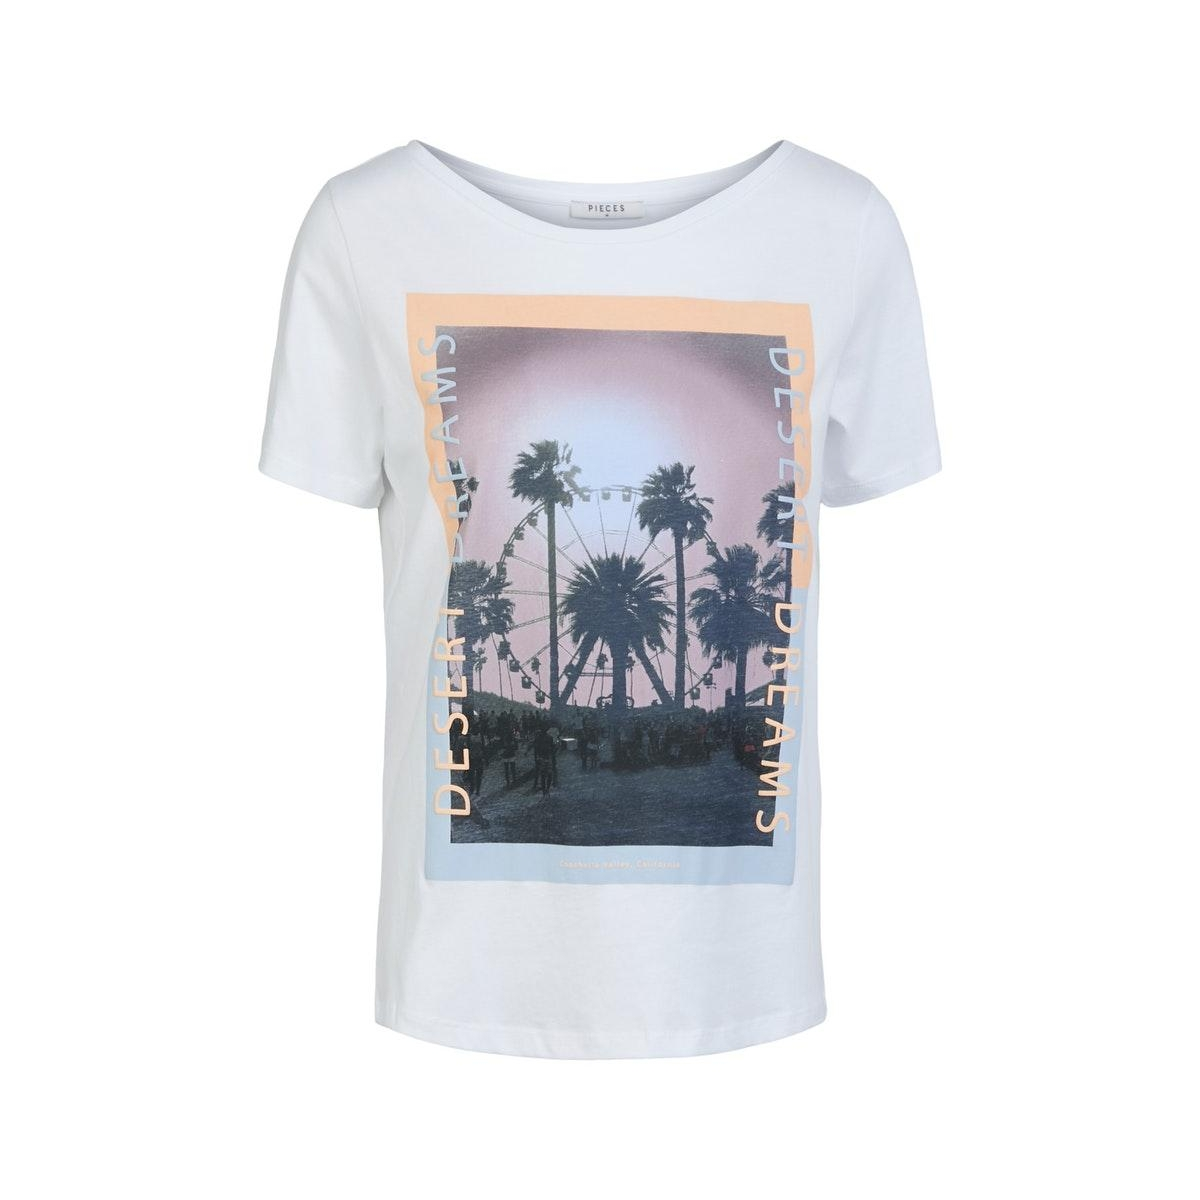 pcasali ss print tee bc 17103964 pieces t-shirt bright white/desert dre